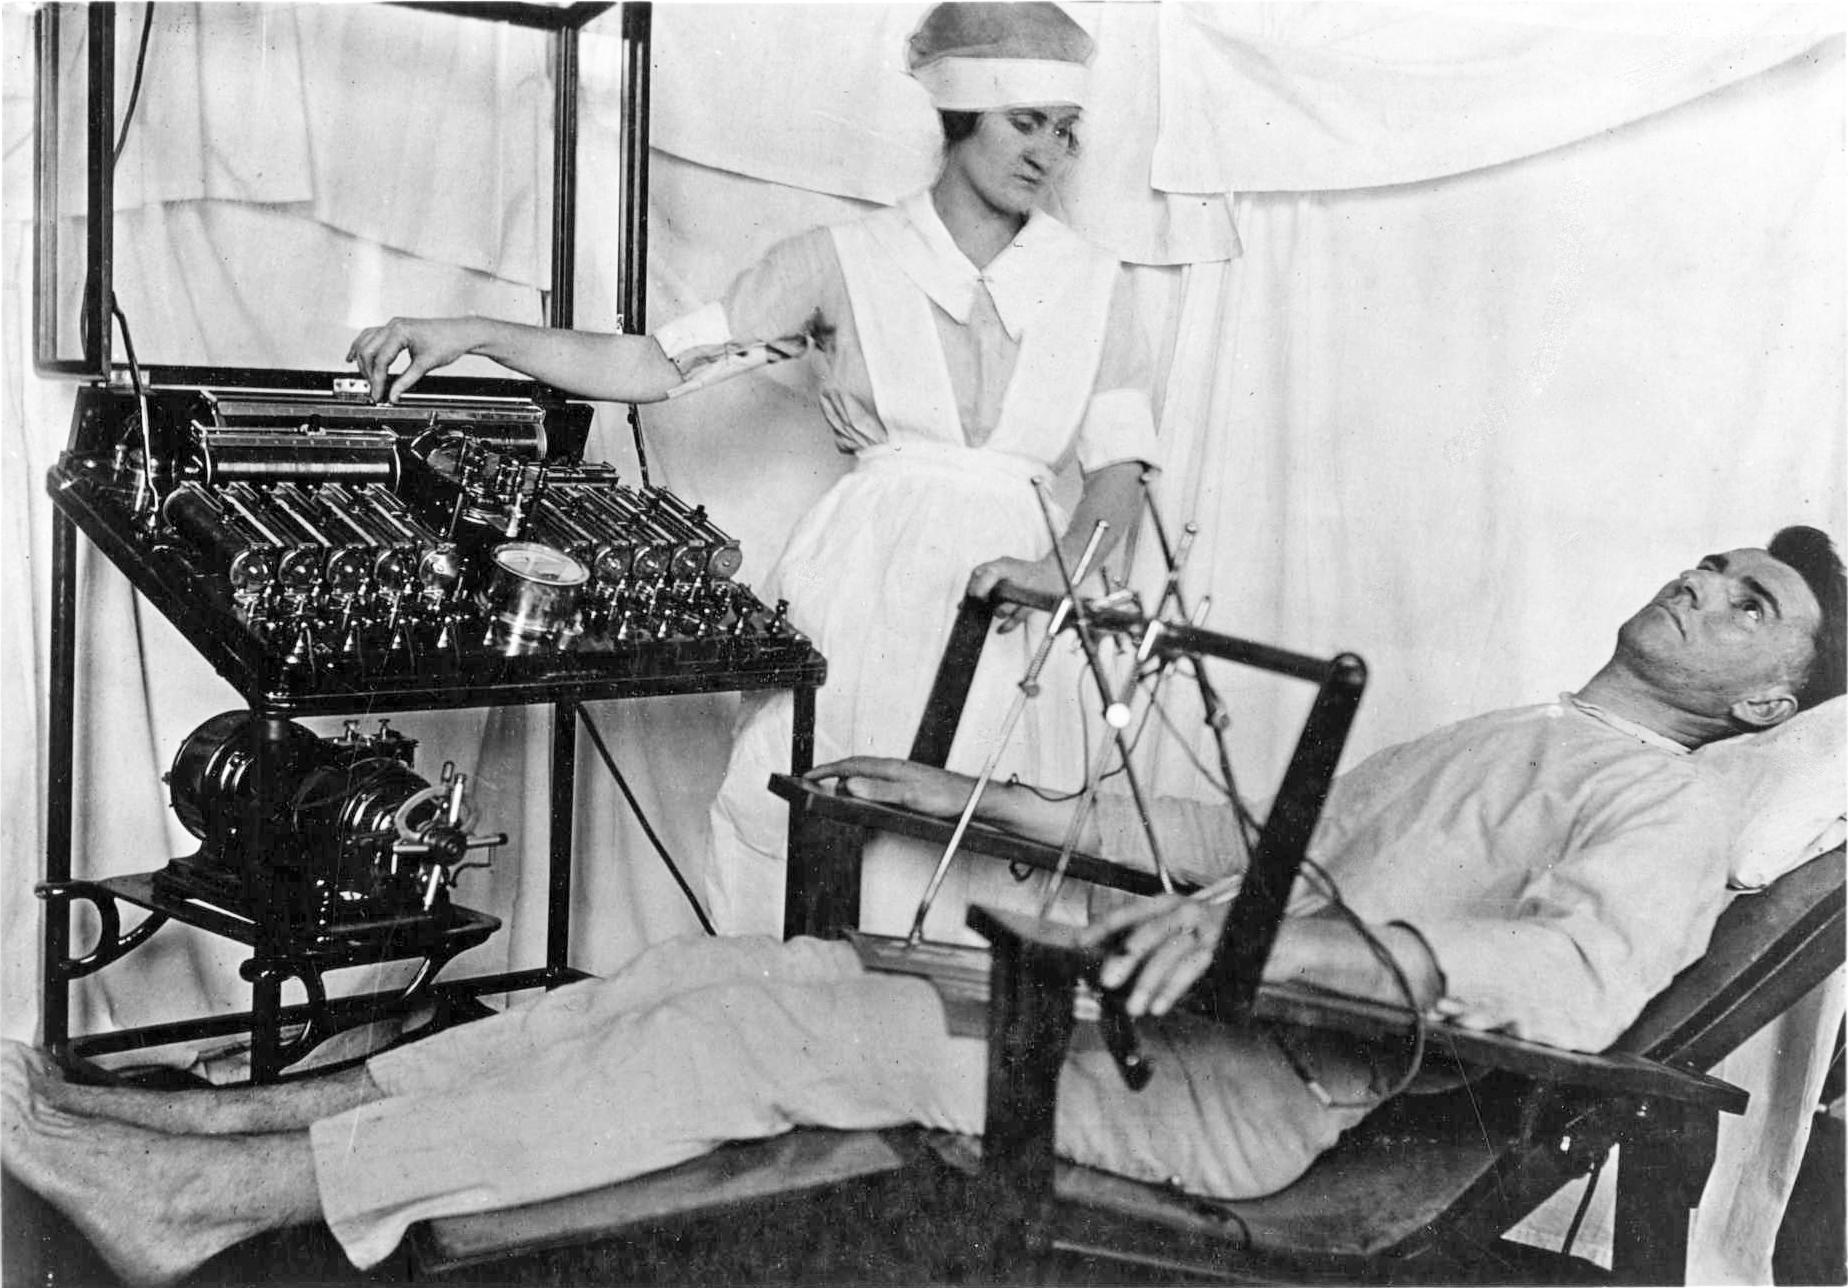 Electroconvulsive therapy - Wikipedia, the free encyclopedia